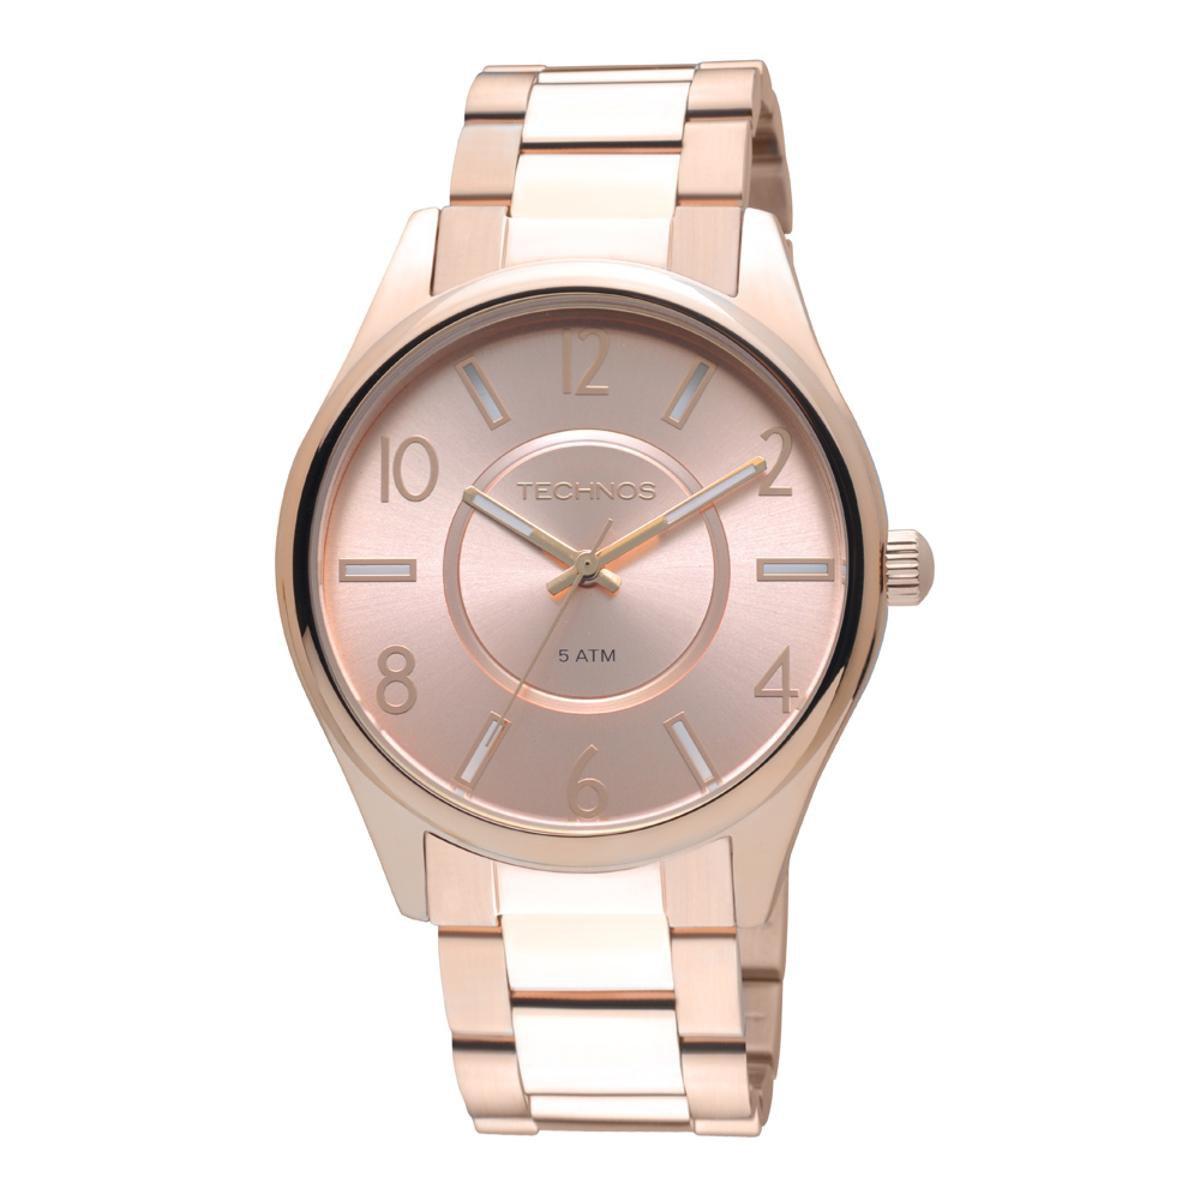 Relógio Technos Feminino Analógico Gold 2035LPI 4T 2035LPI 4T ... c0330e8b77